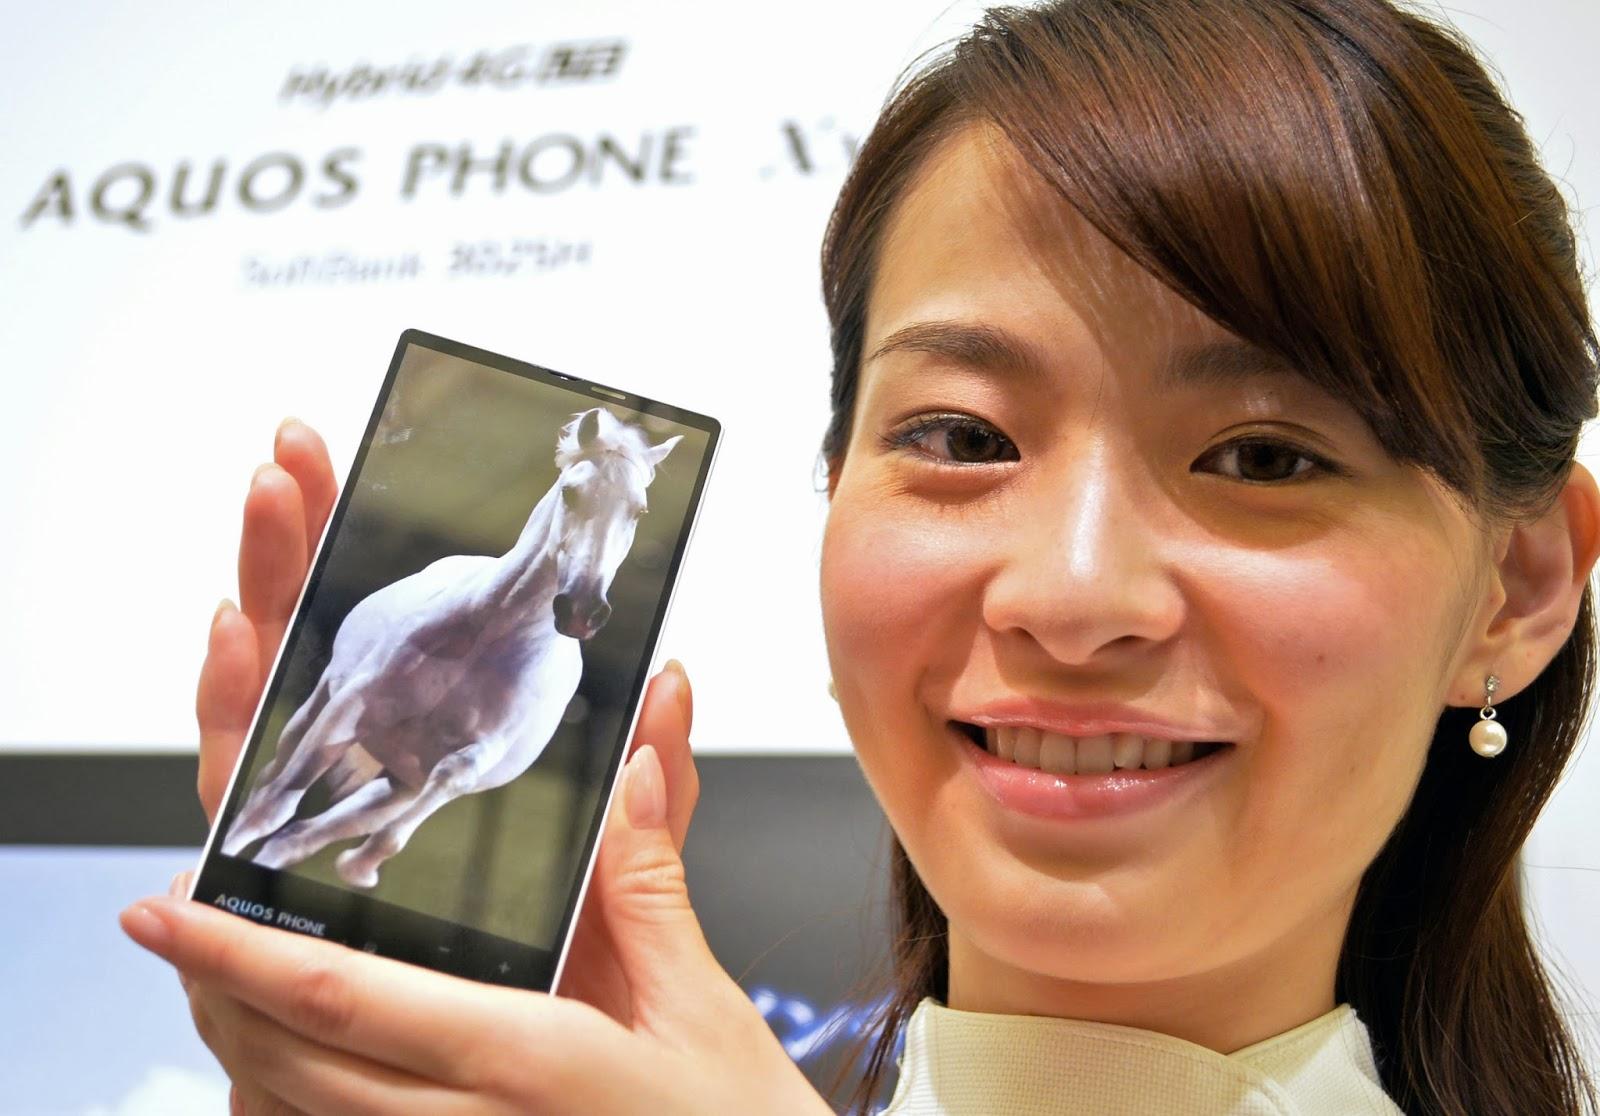 AQUOS PHONE Xx, Electronics, Hybrid 4G LTE, Japan, Mobile, Smartphones, SoftBank, Technology, Telecom, Tokyo,